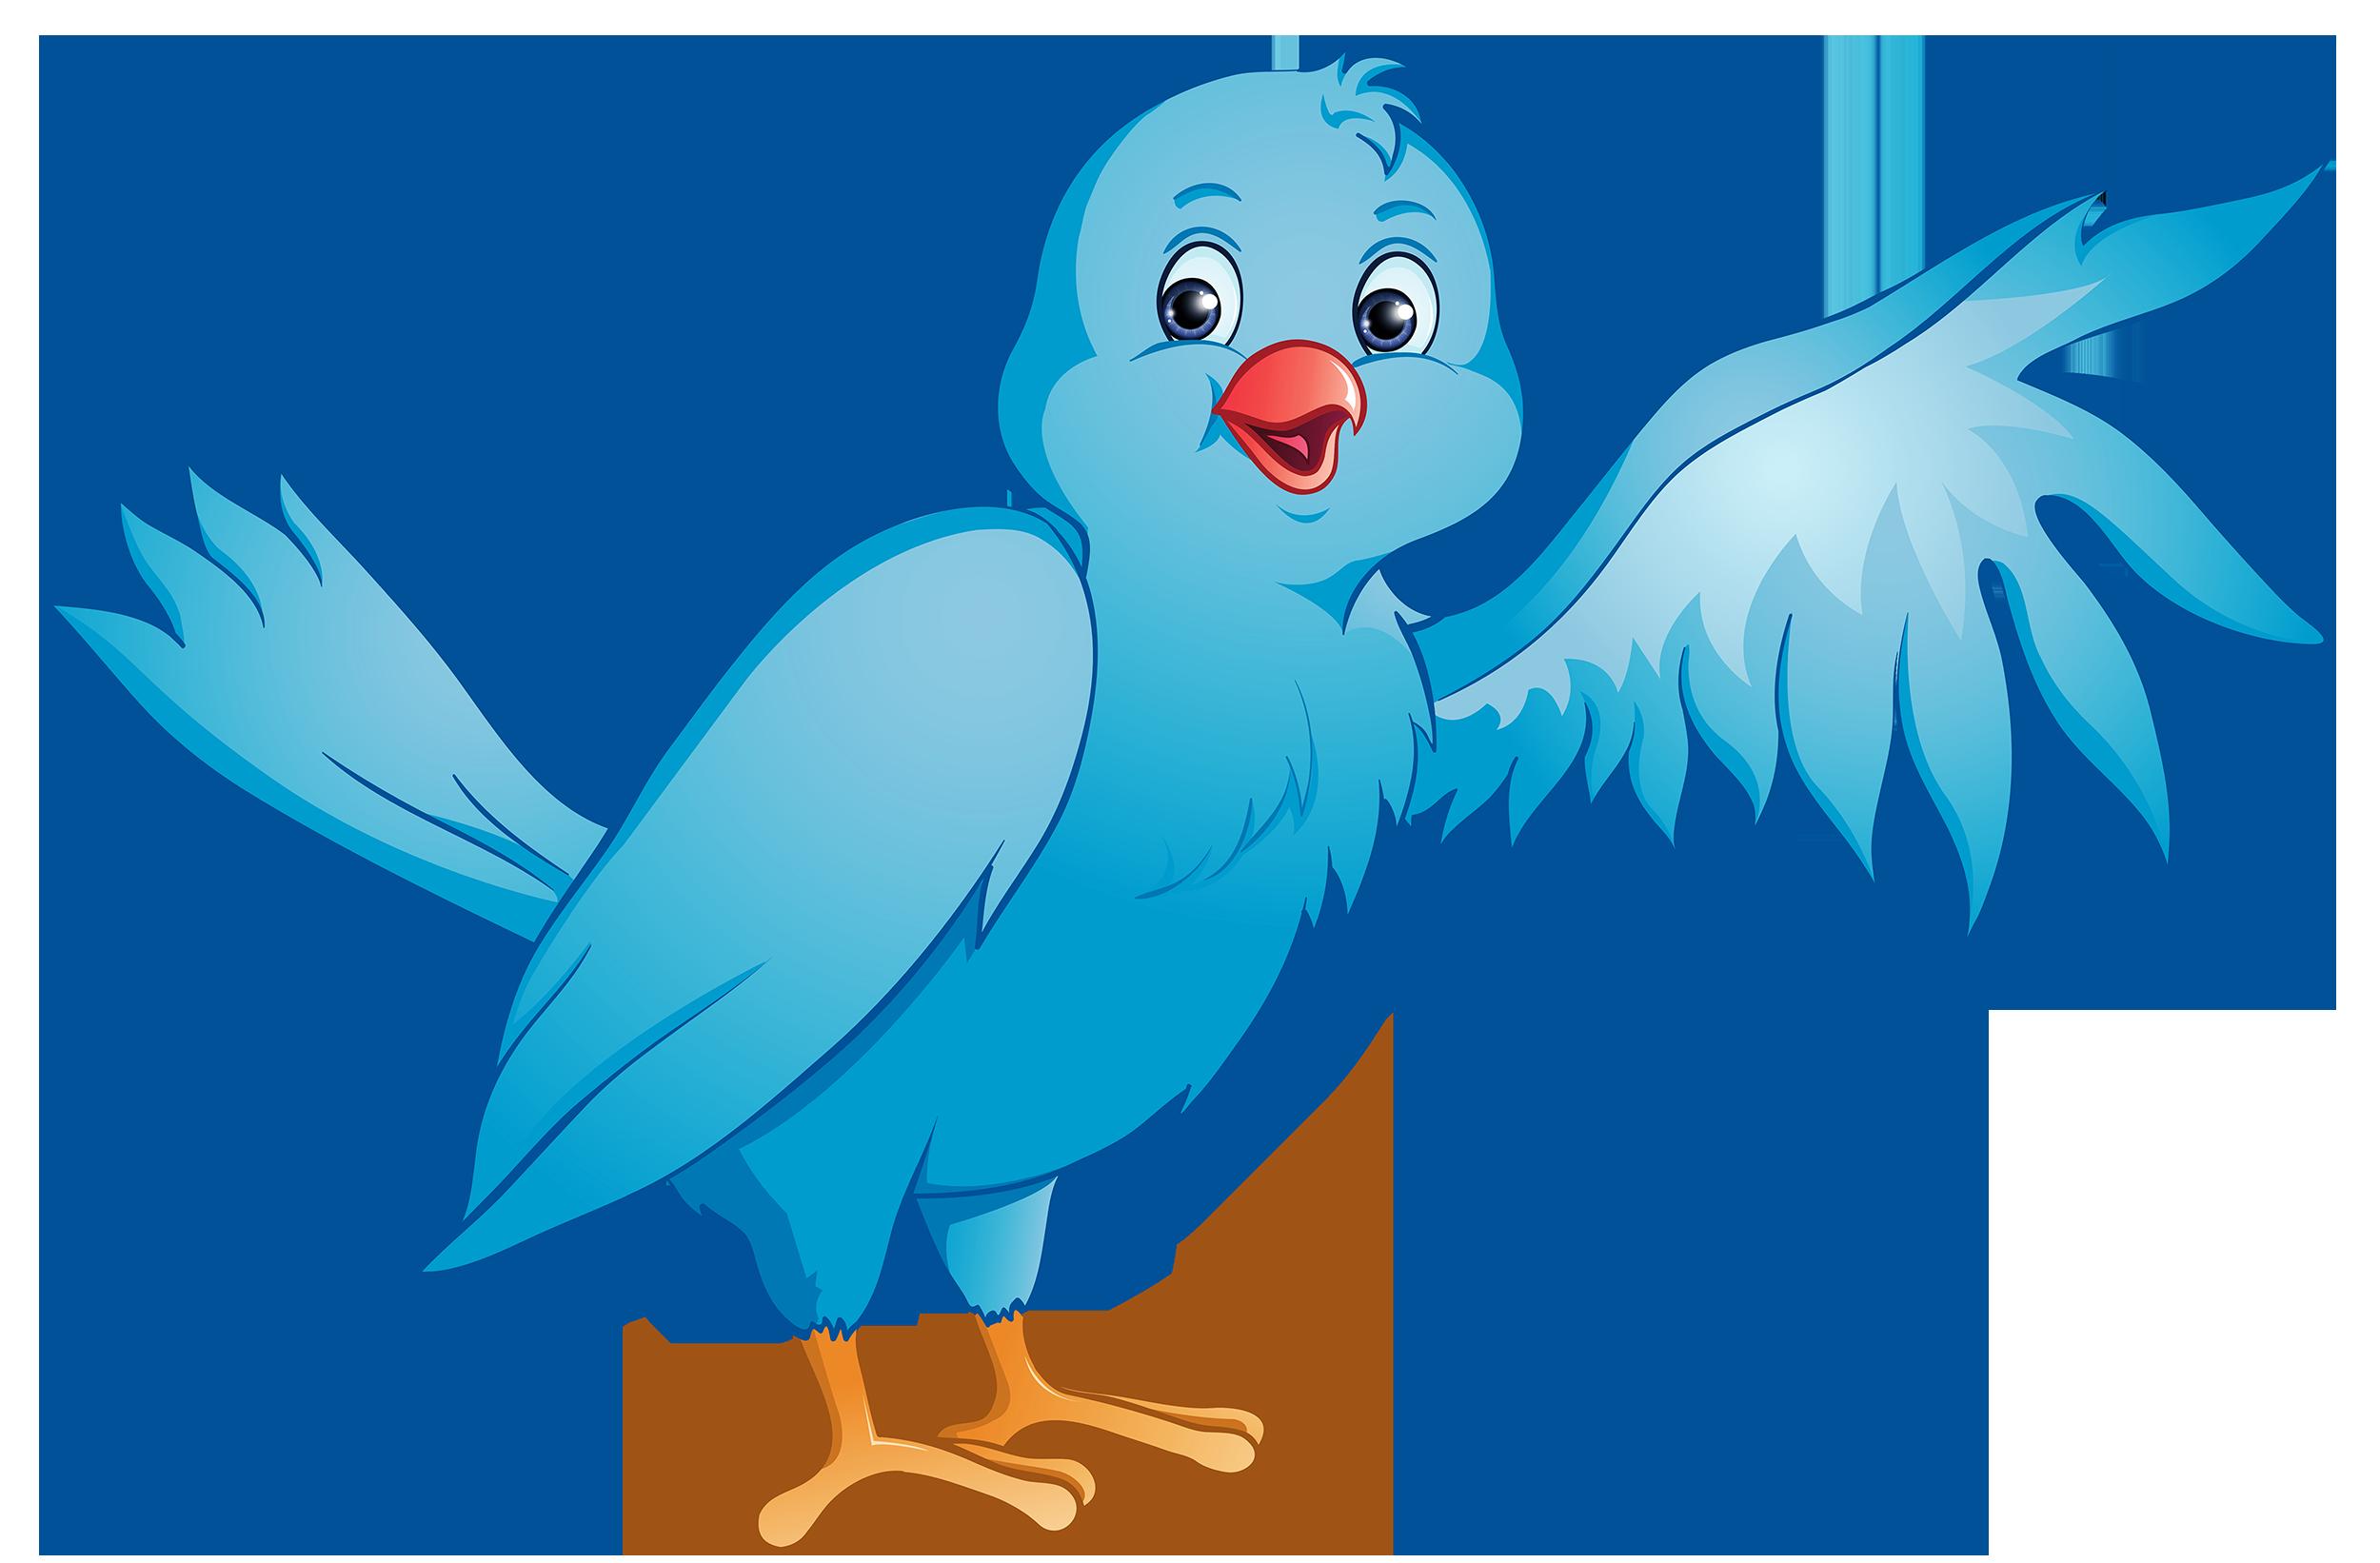 Free animated bird.